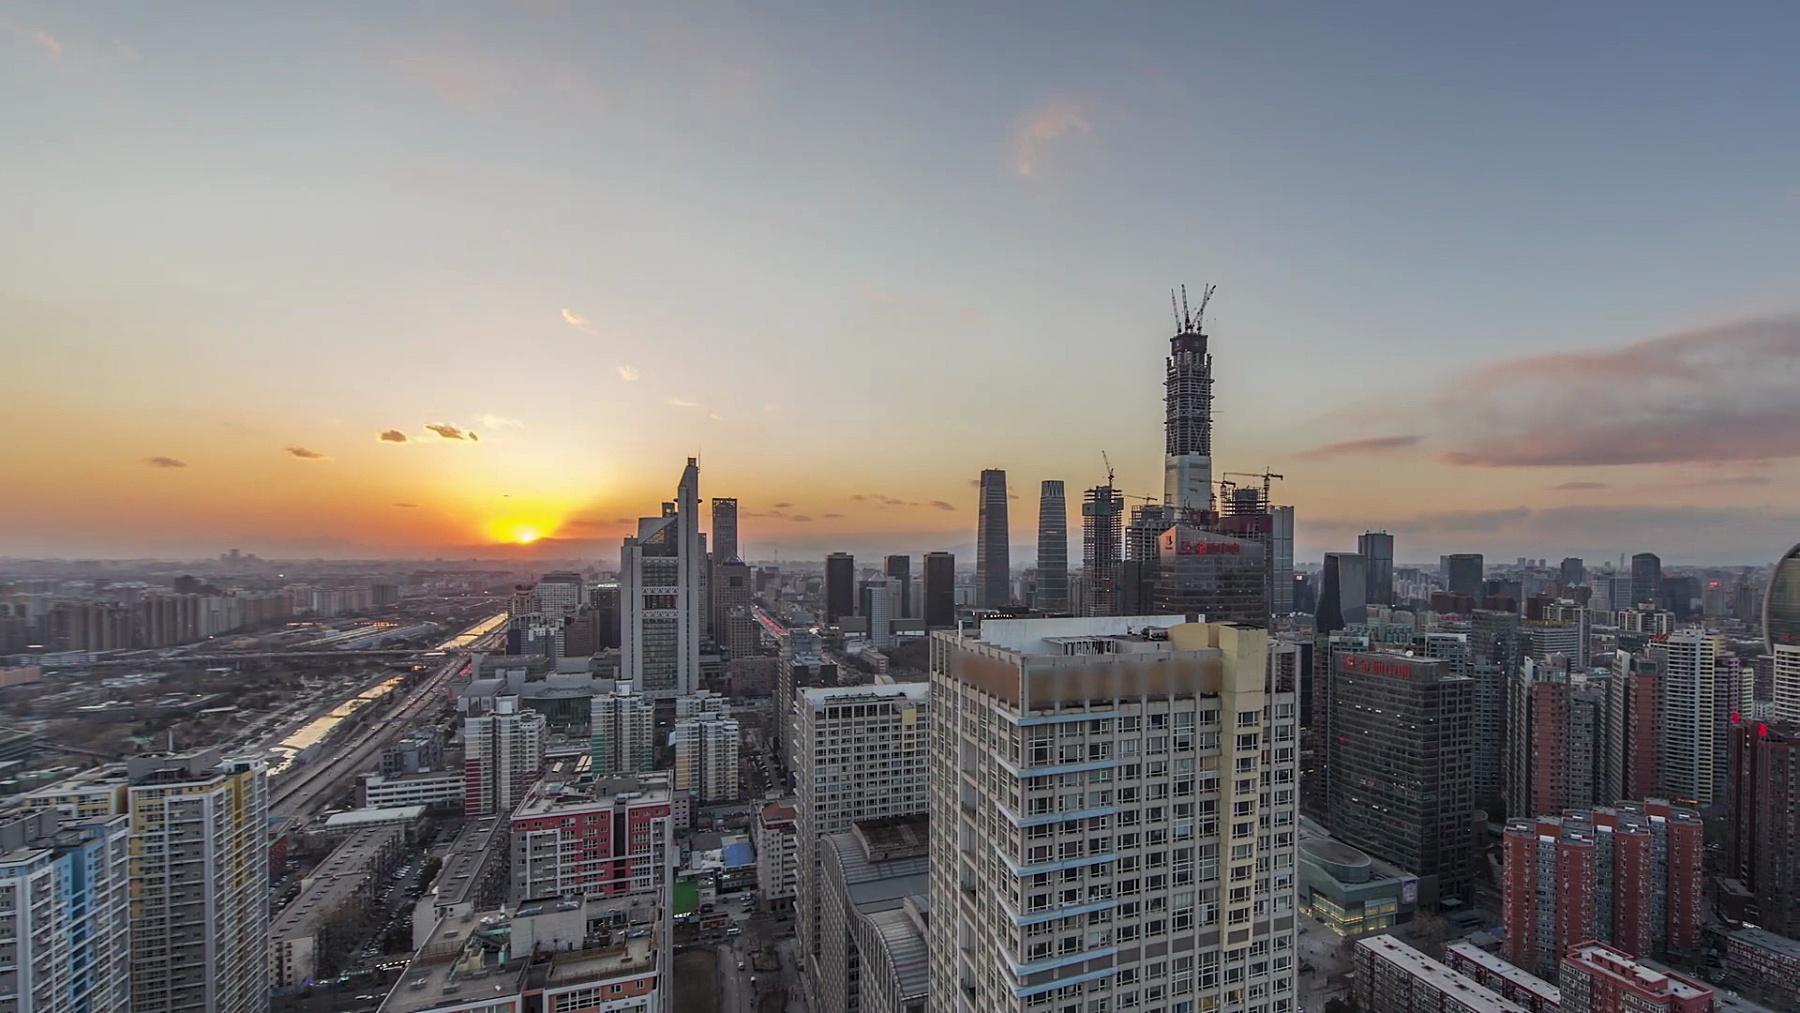 T/L WS HA PAN北京市中心,日落到黄昏过渡/中国北京